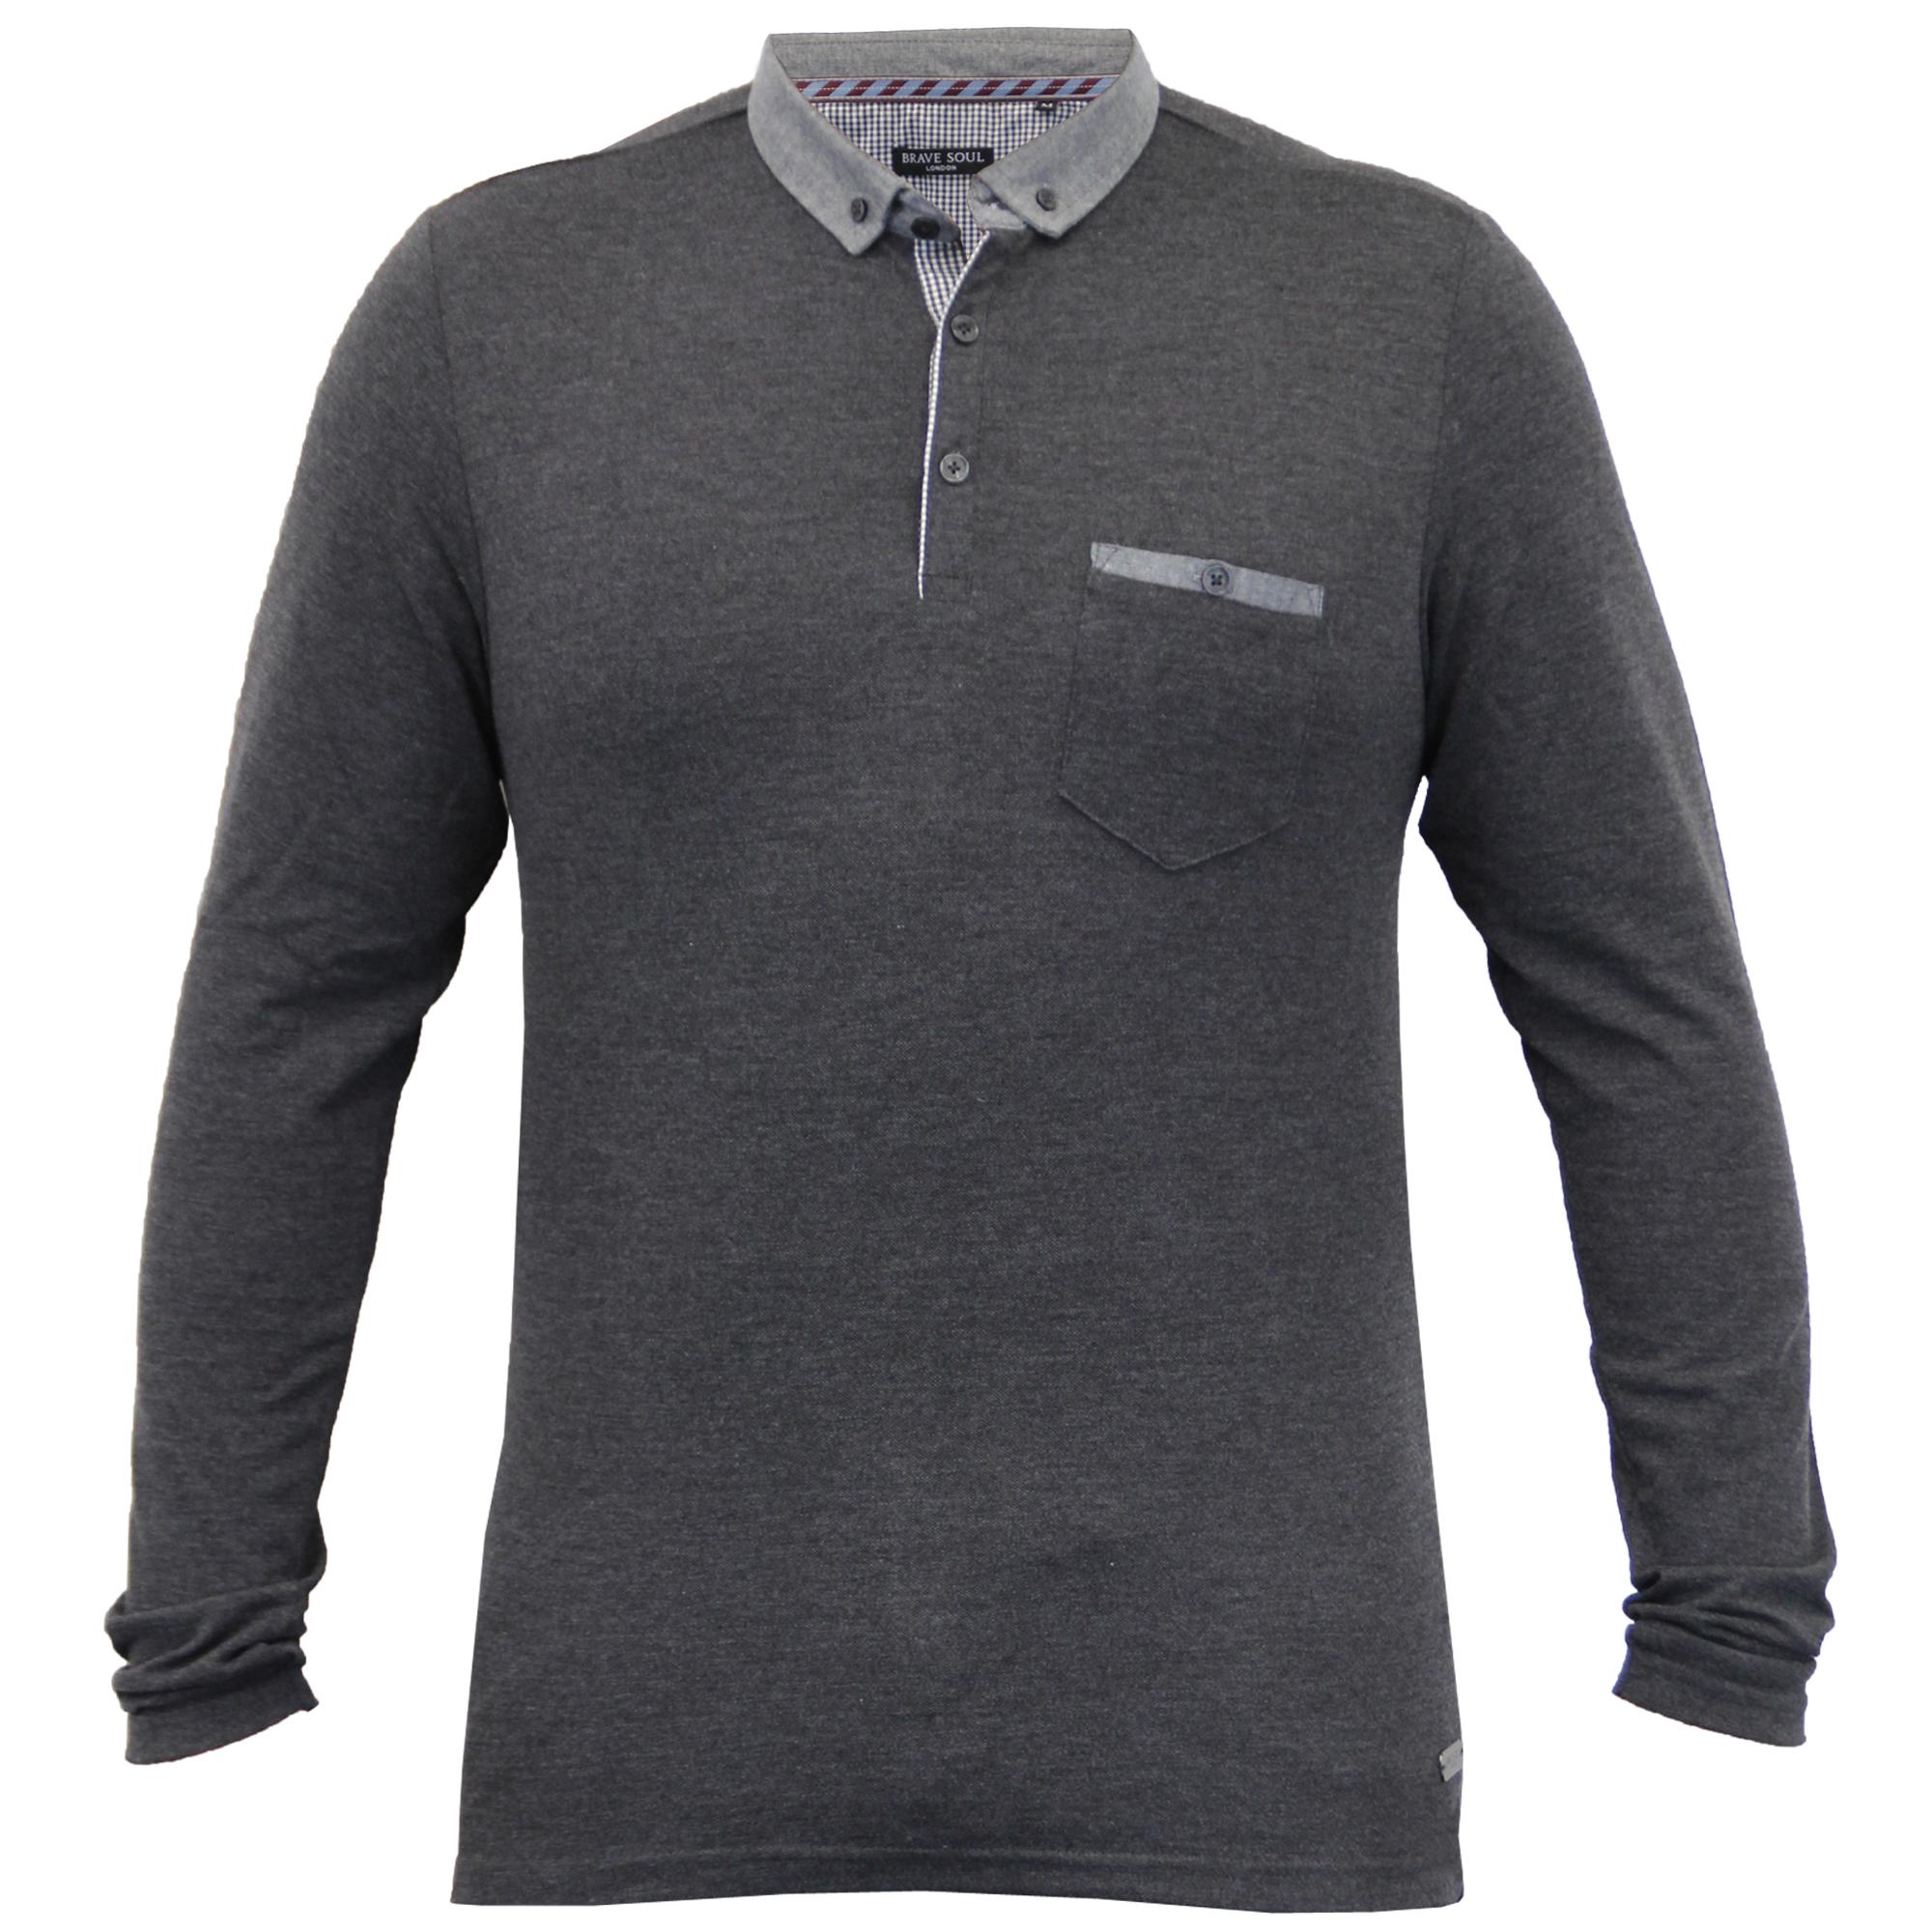 Homme-a-Manches-Longues-Jersey-Top-Brave-Soul-Pique-Polo-T-Shirt-A-Col-Ete-Neuf miniature 12